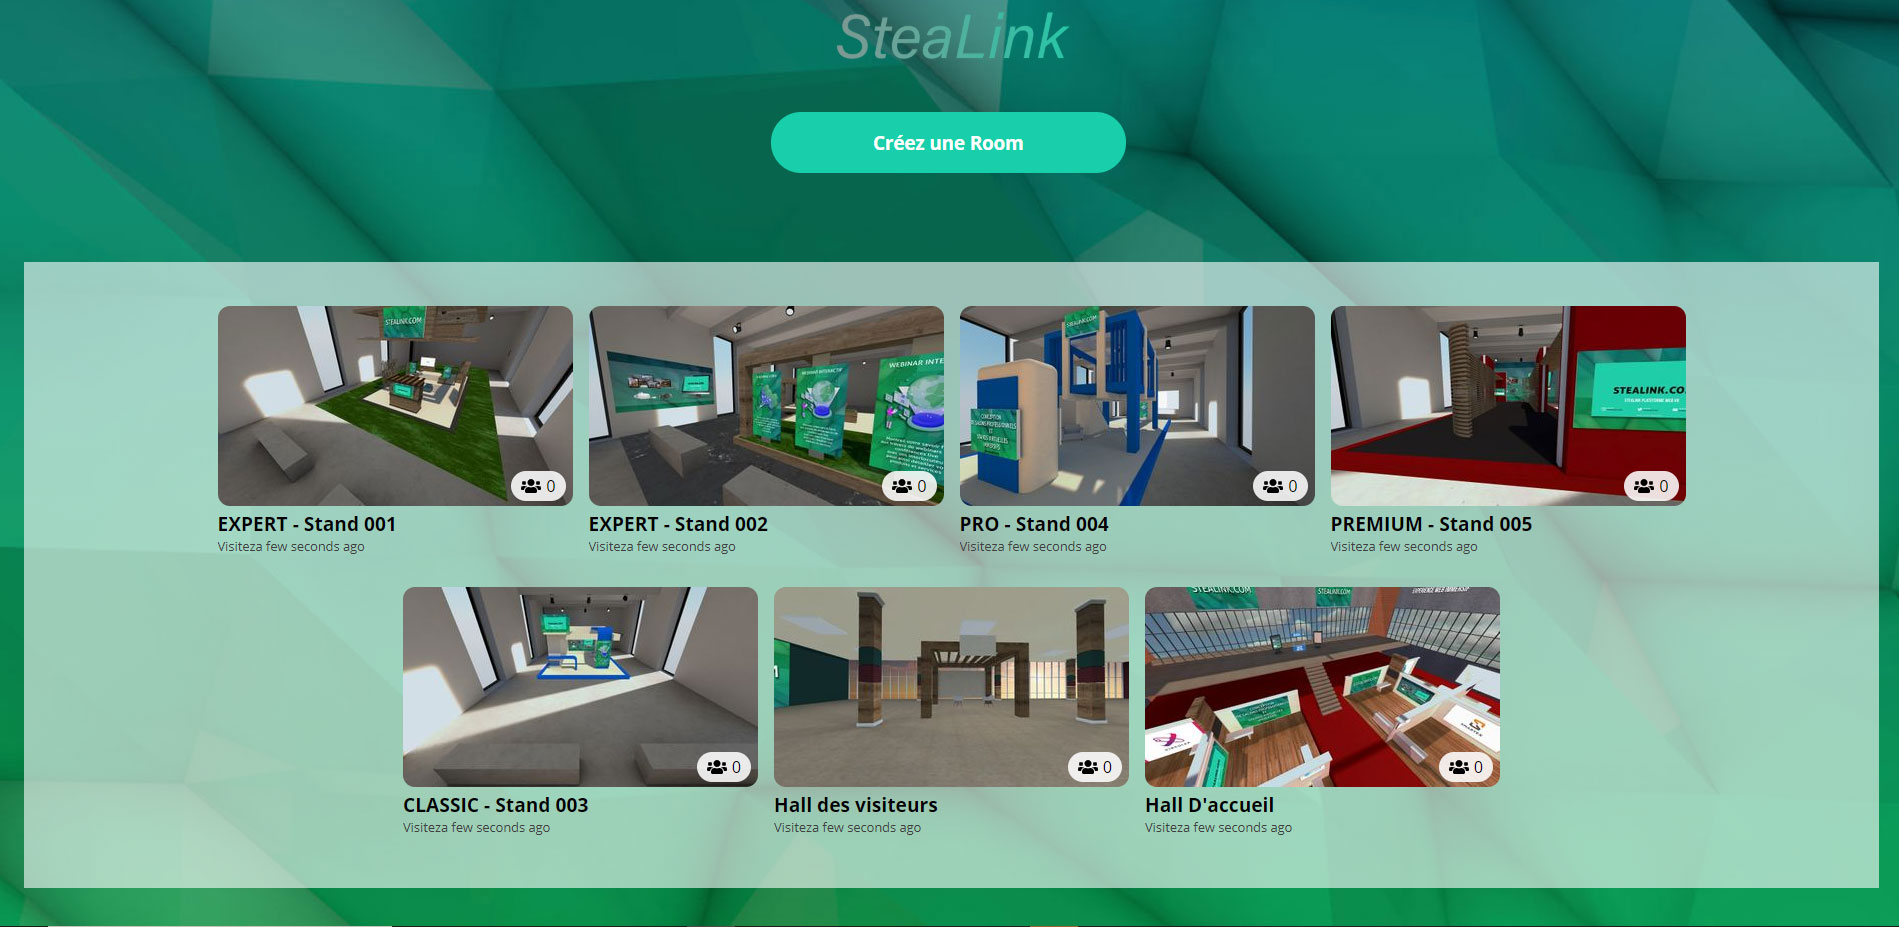 STEALINK.COM StandVirtuel Festival de musique virtuel